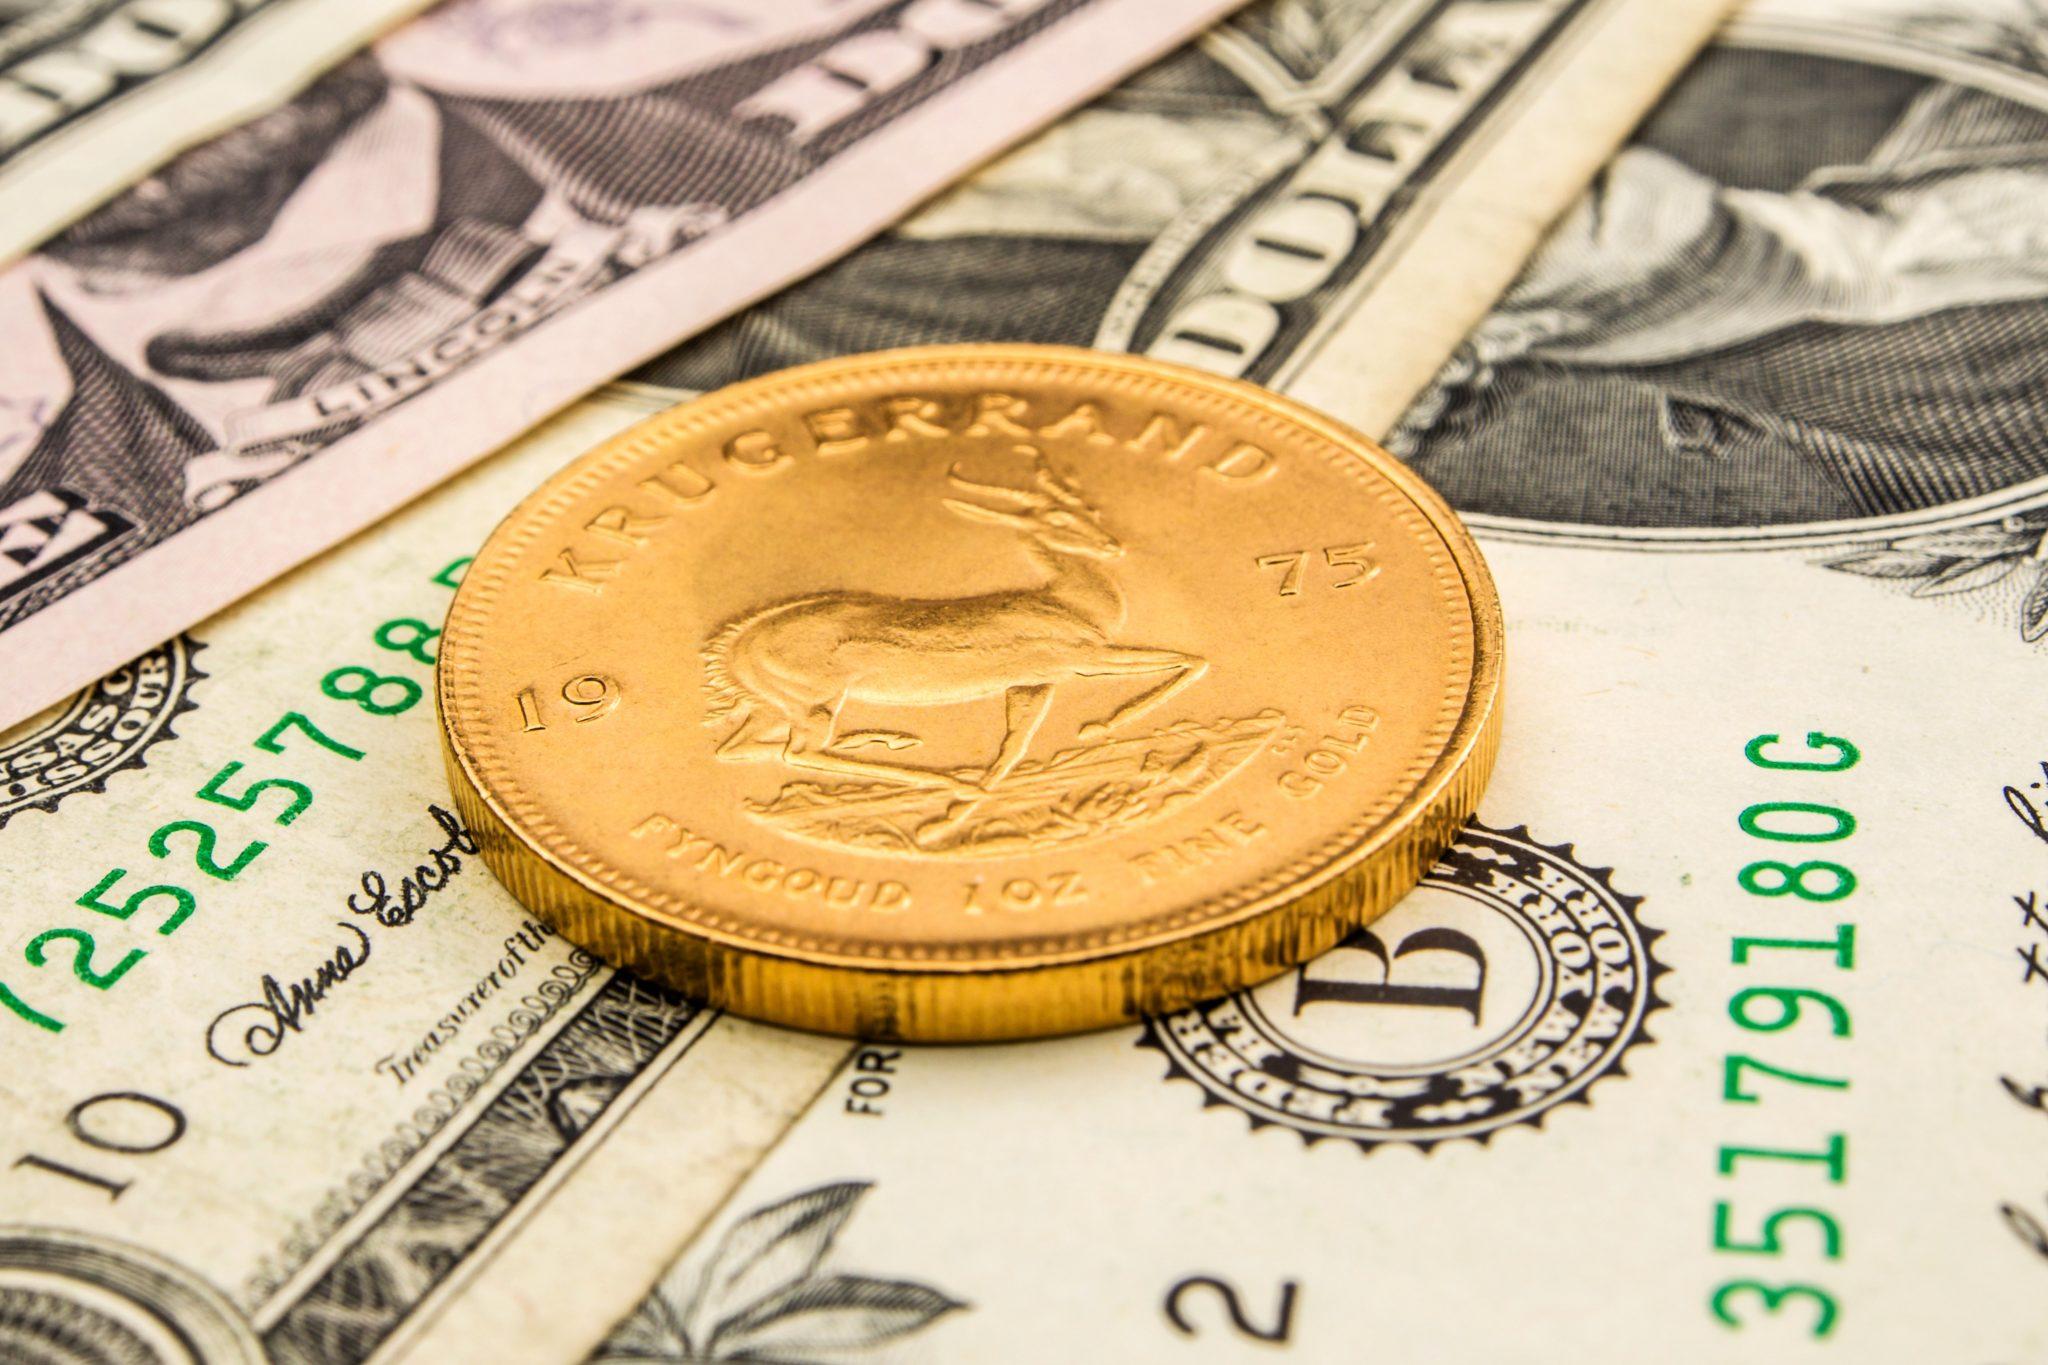 Goldbarren kaufen, Silbermünzen, Prepper